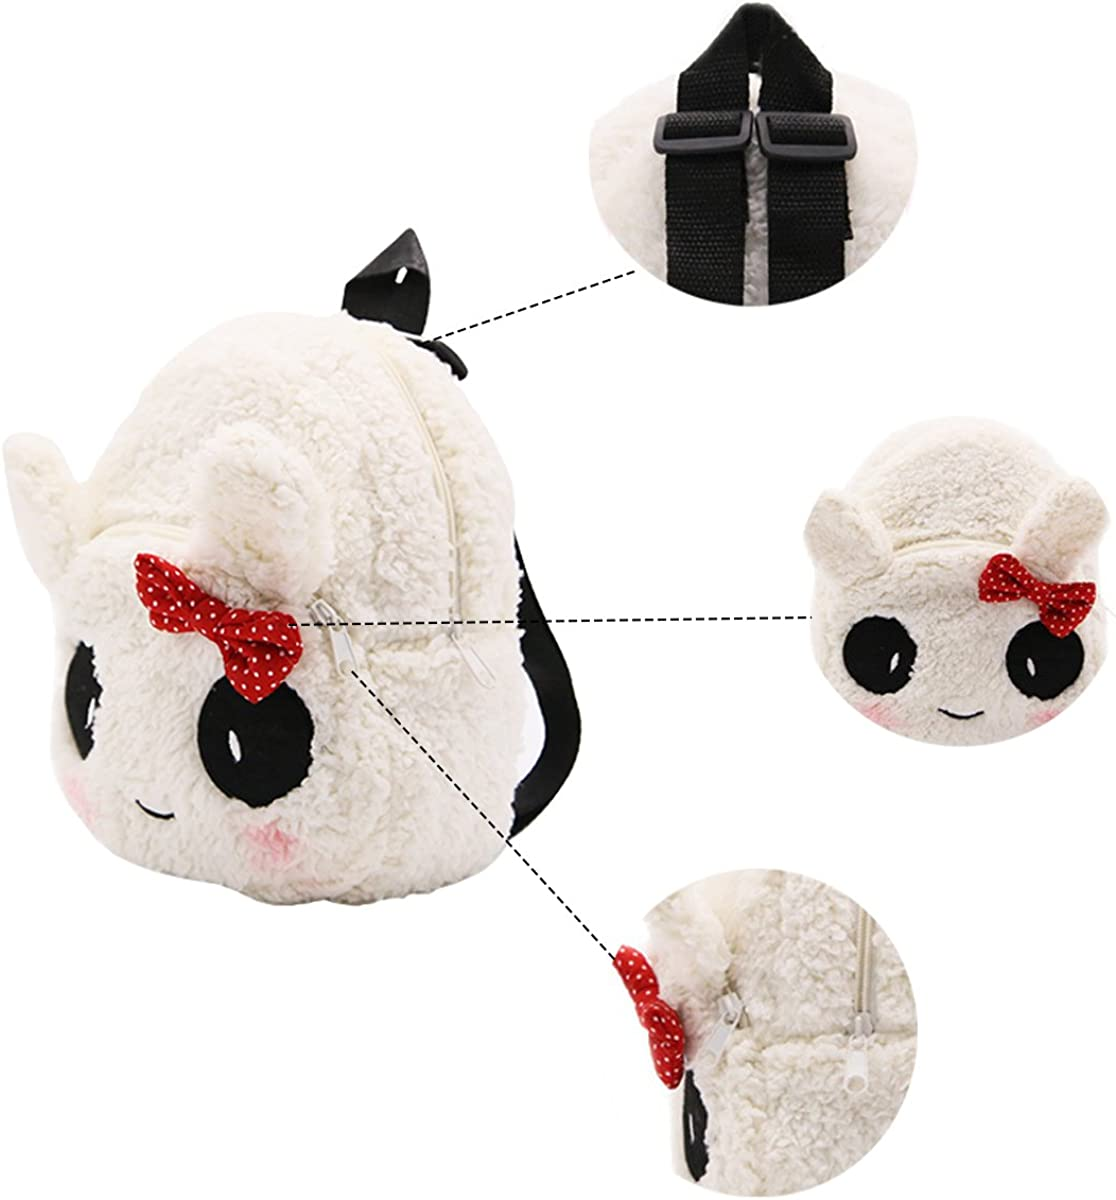 Evaliana Kindergarten Satchel Childrens Lunch Bag Panda Backpack Cute Plush Bags Kids